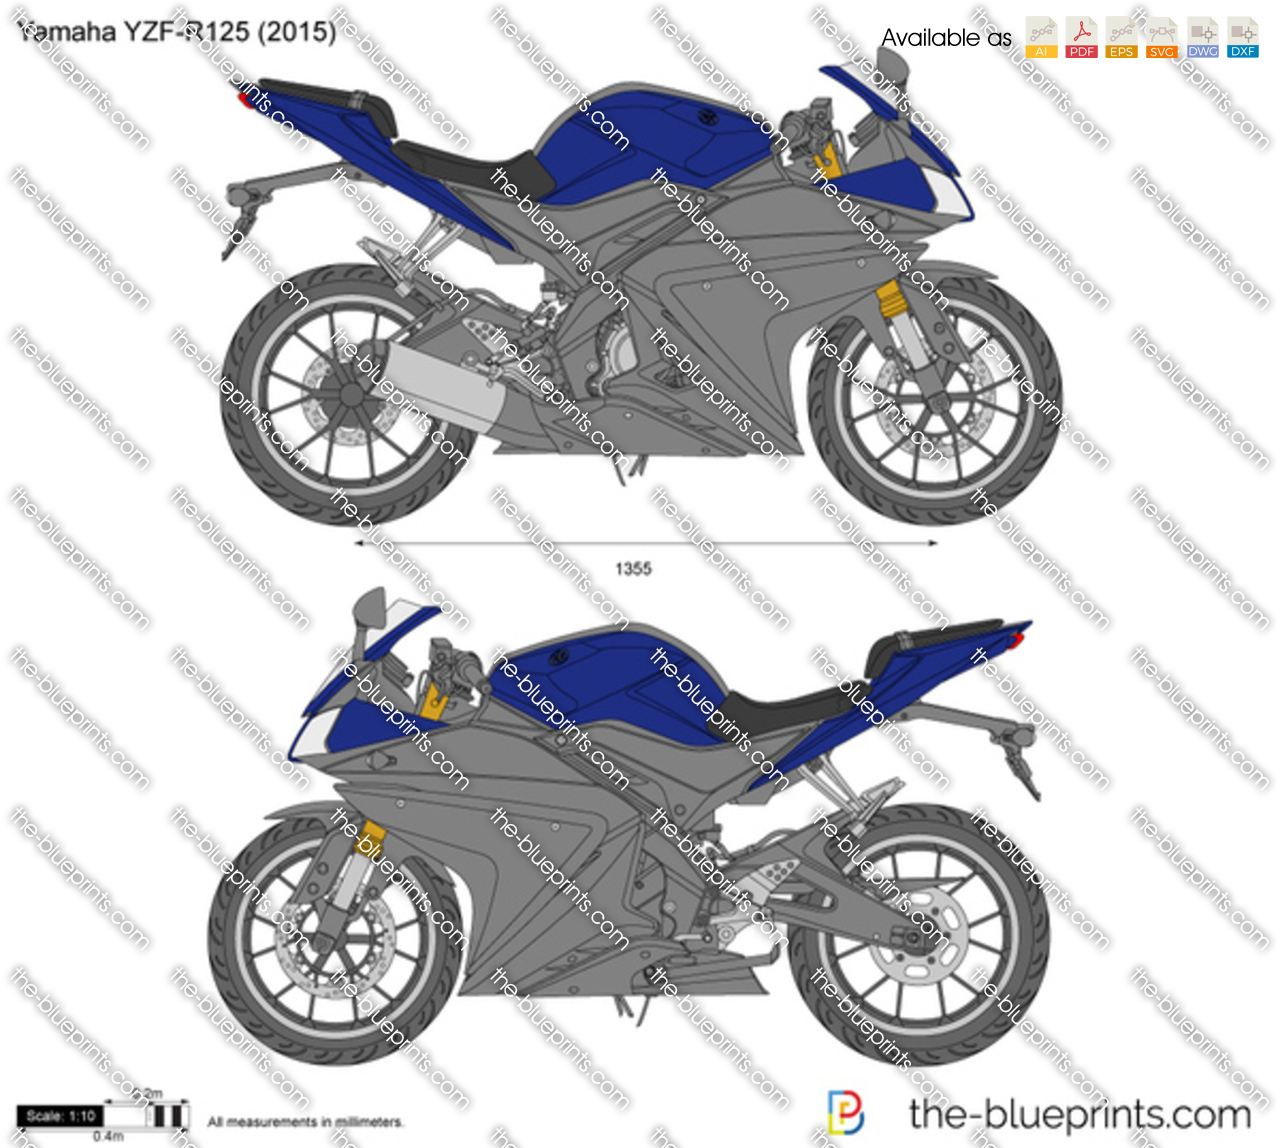 Yamaha YZF-R125 2017